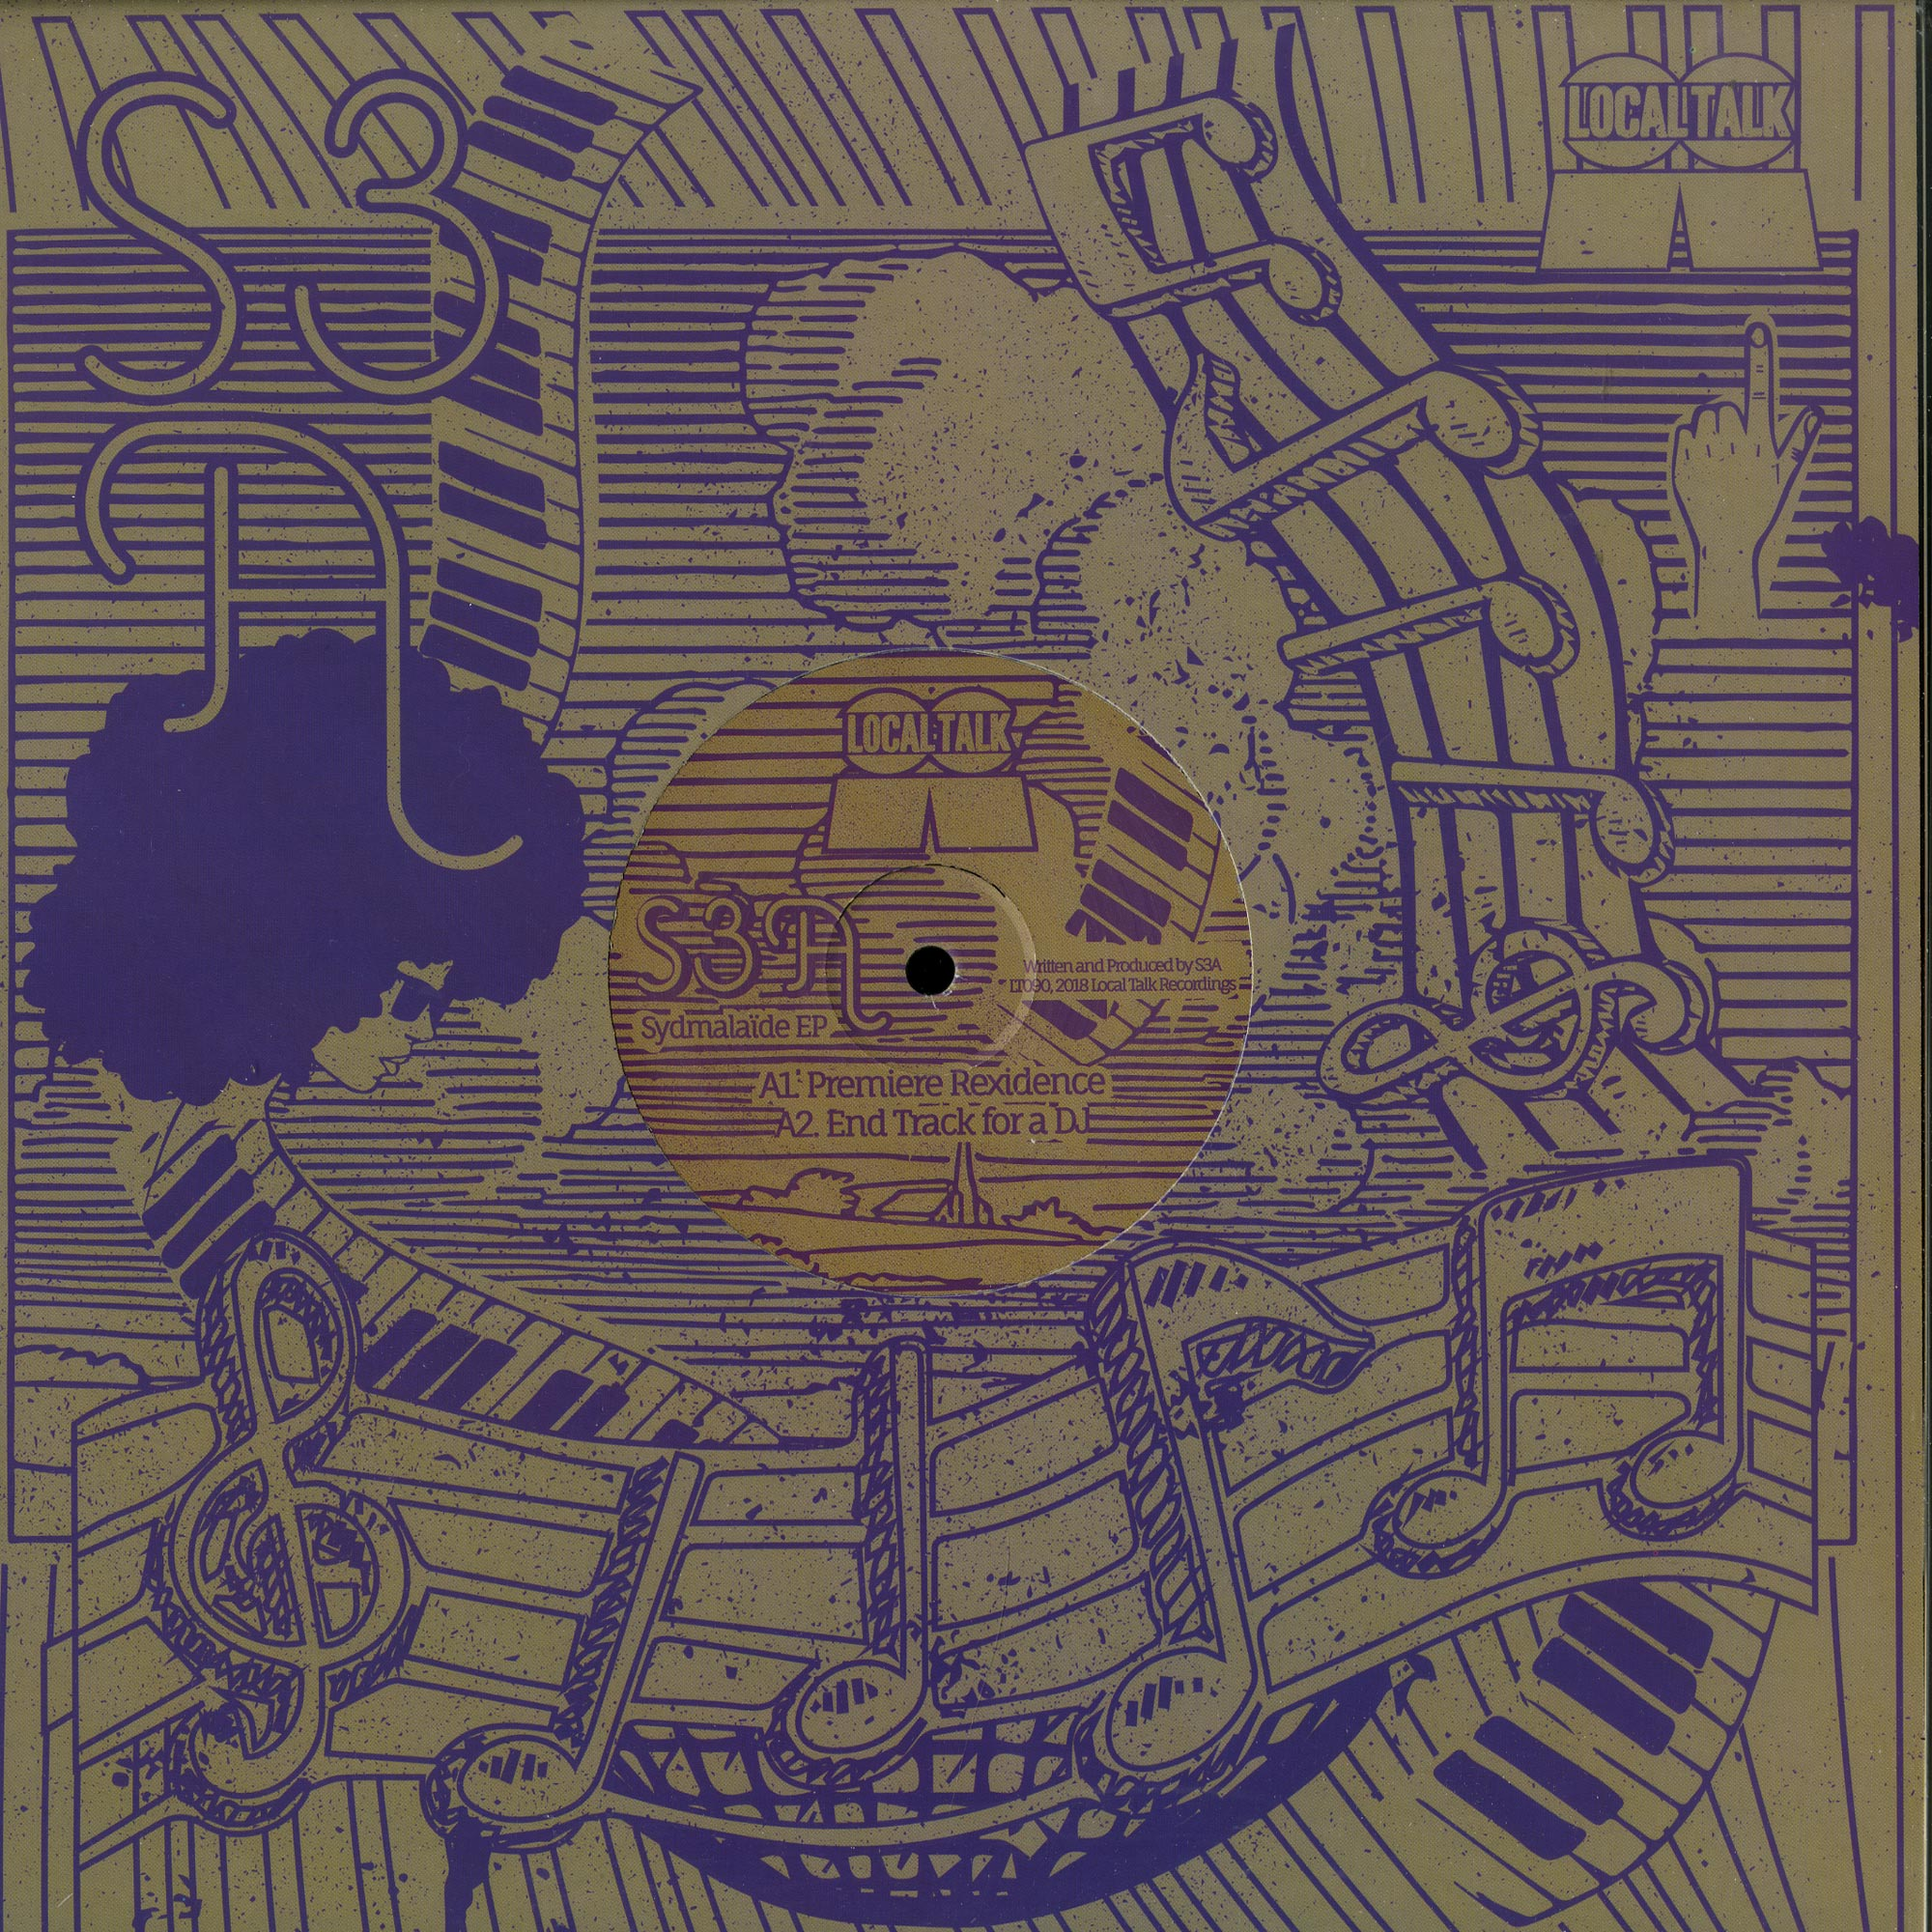 S3A - SYDMALAIDE EP